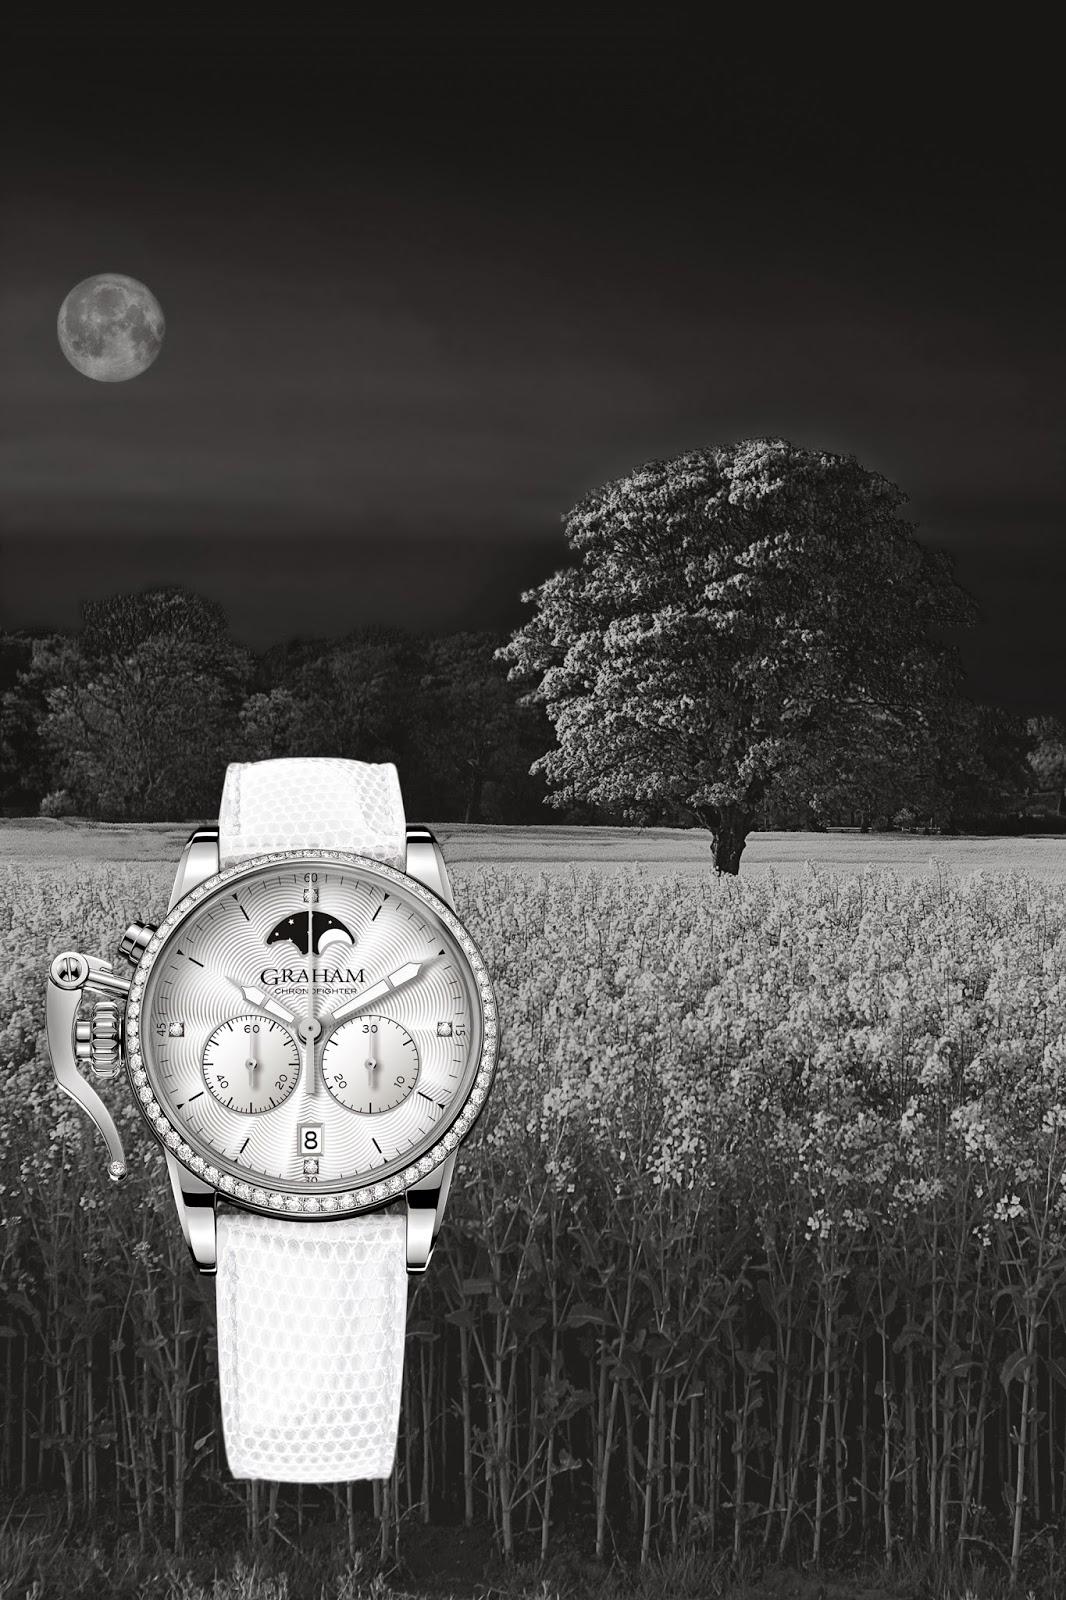 GRAHAM Chronofighter 1695 Lady Moon